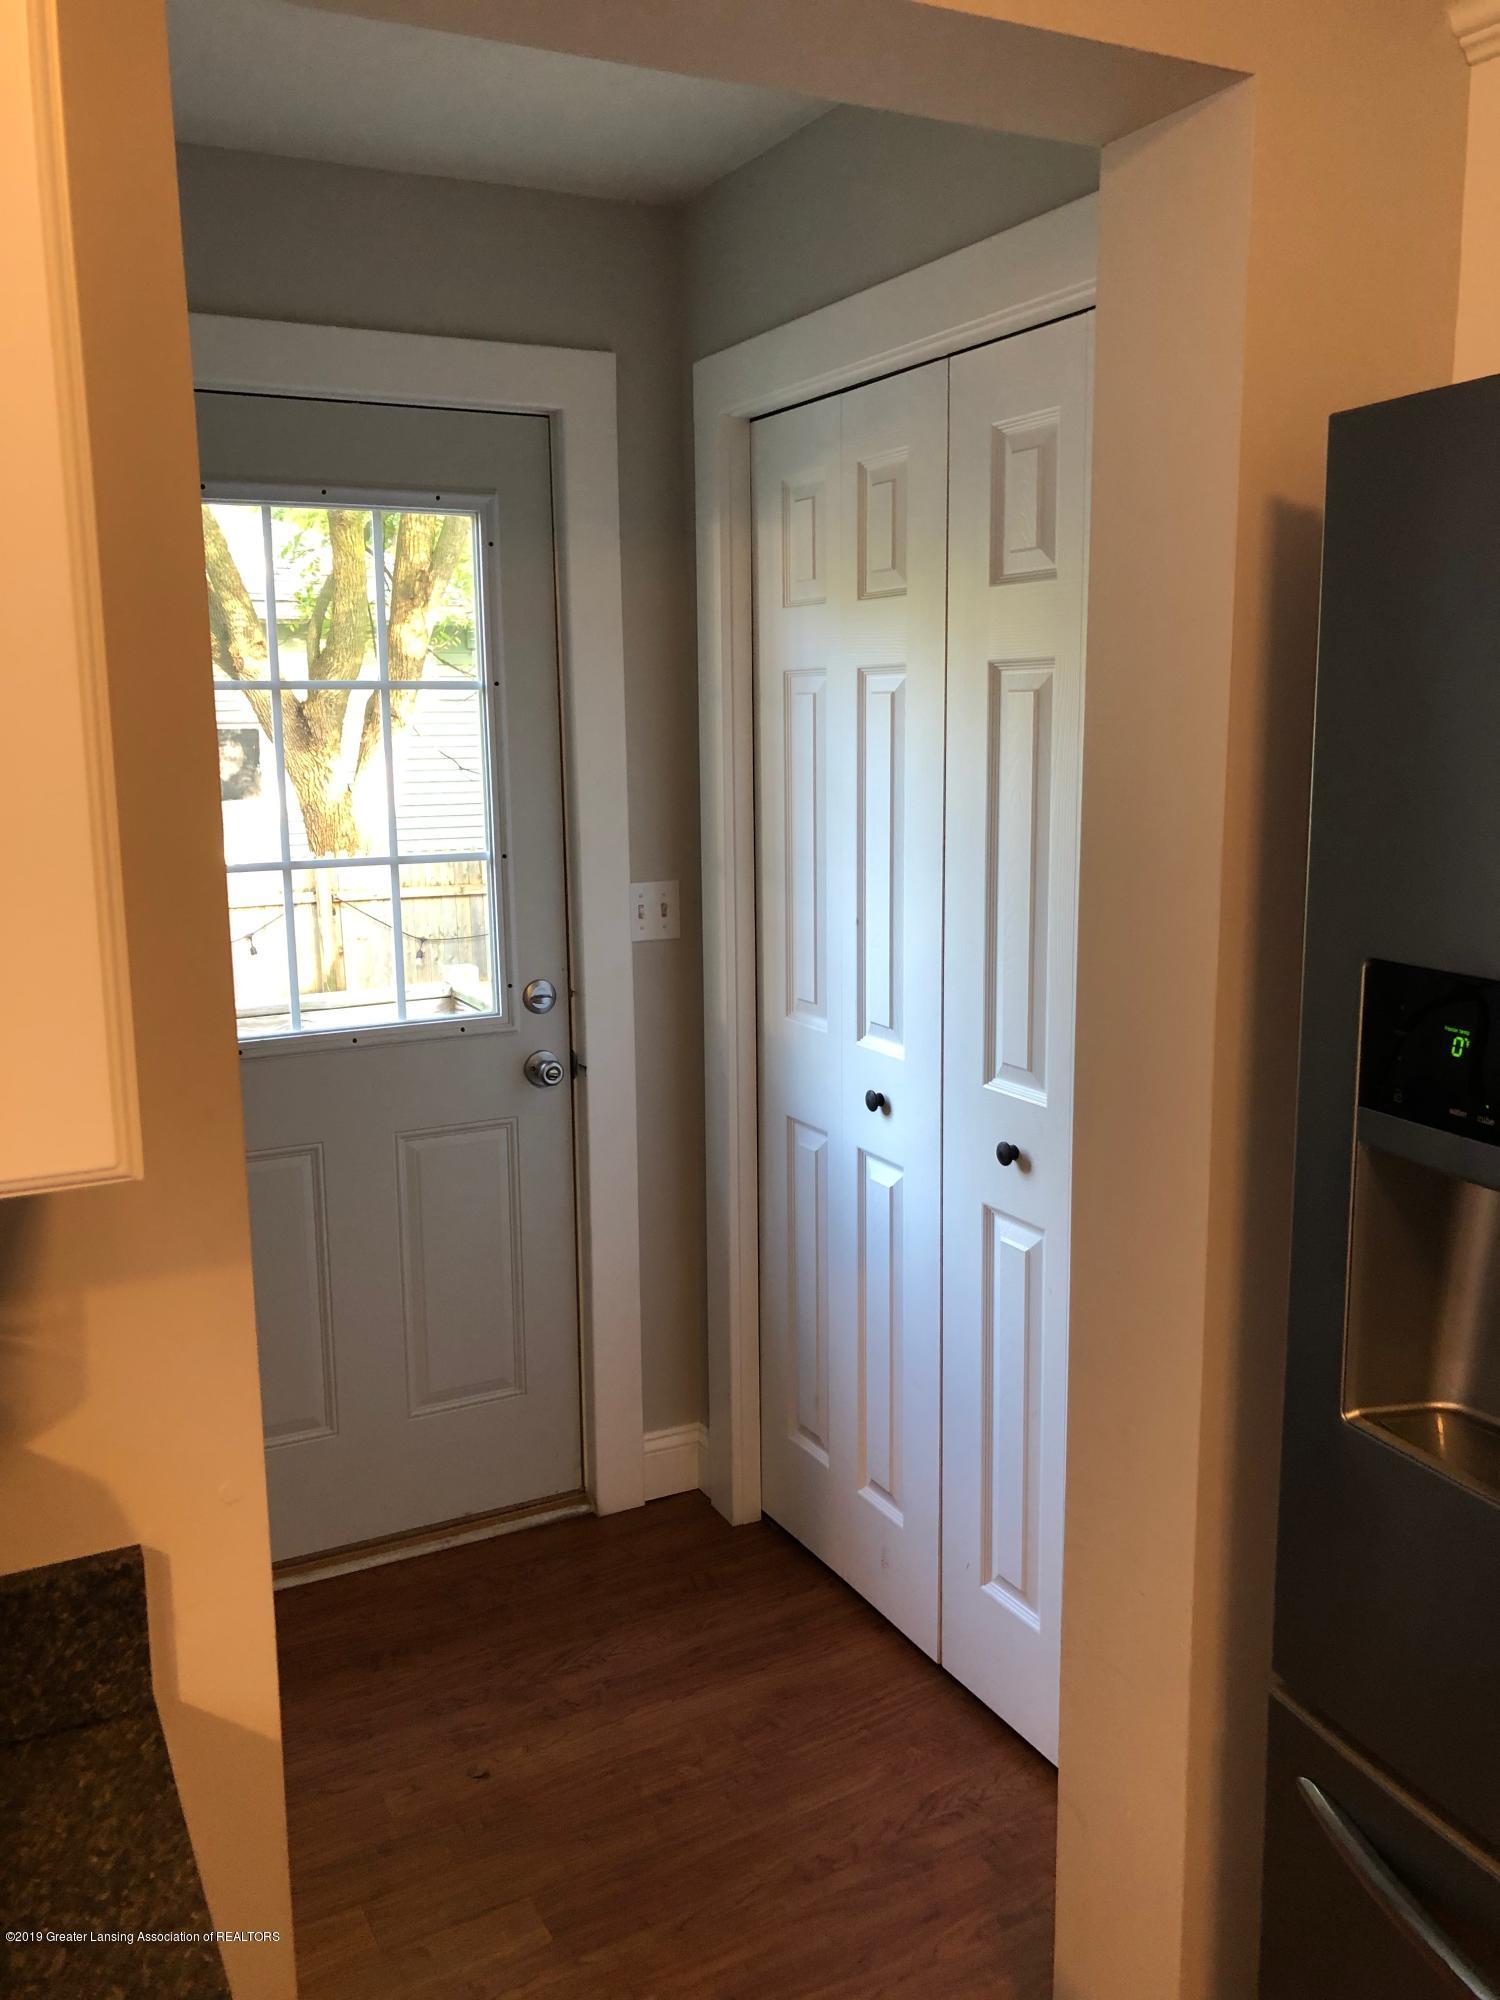 300 E State St - Room off Kitchen - 15